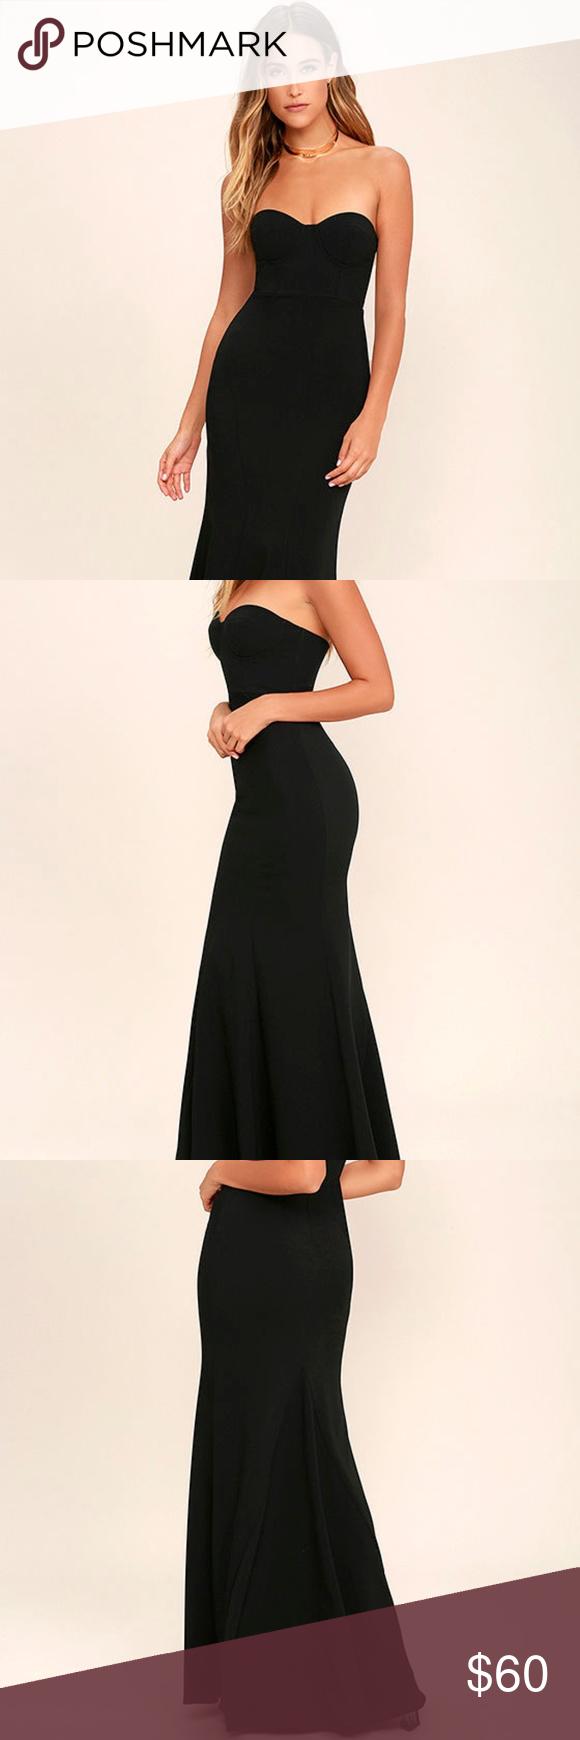 f6eff47a0b Lulu s For Infinity Black Strapless Dress Never worn